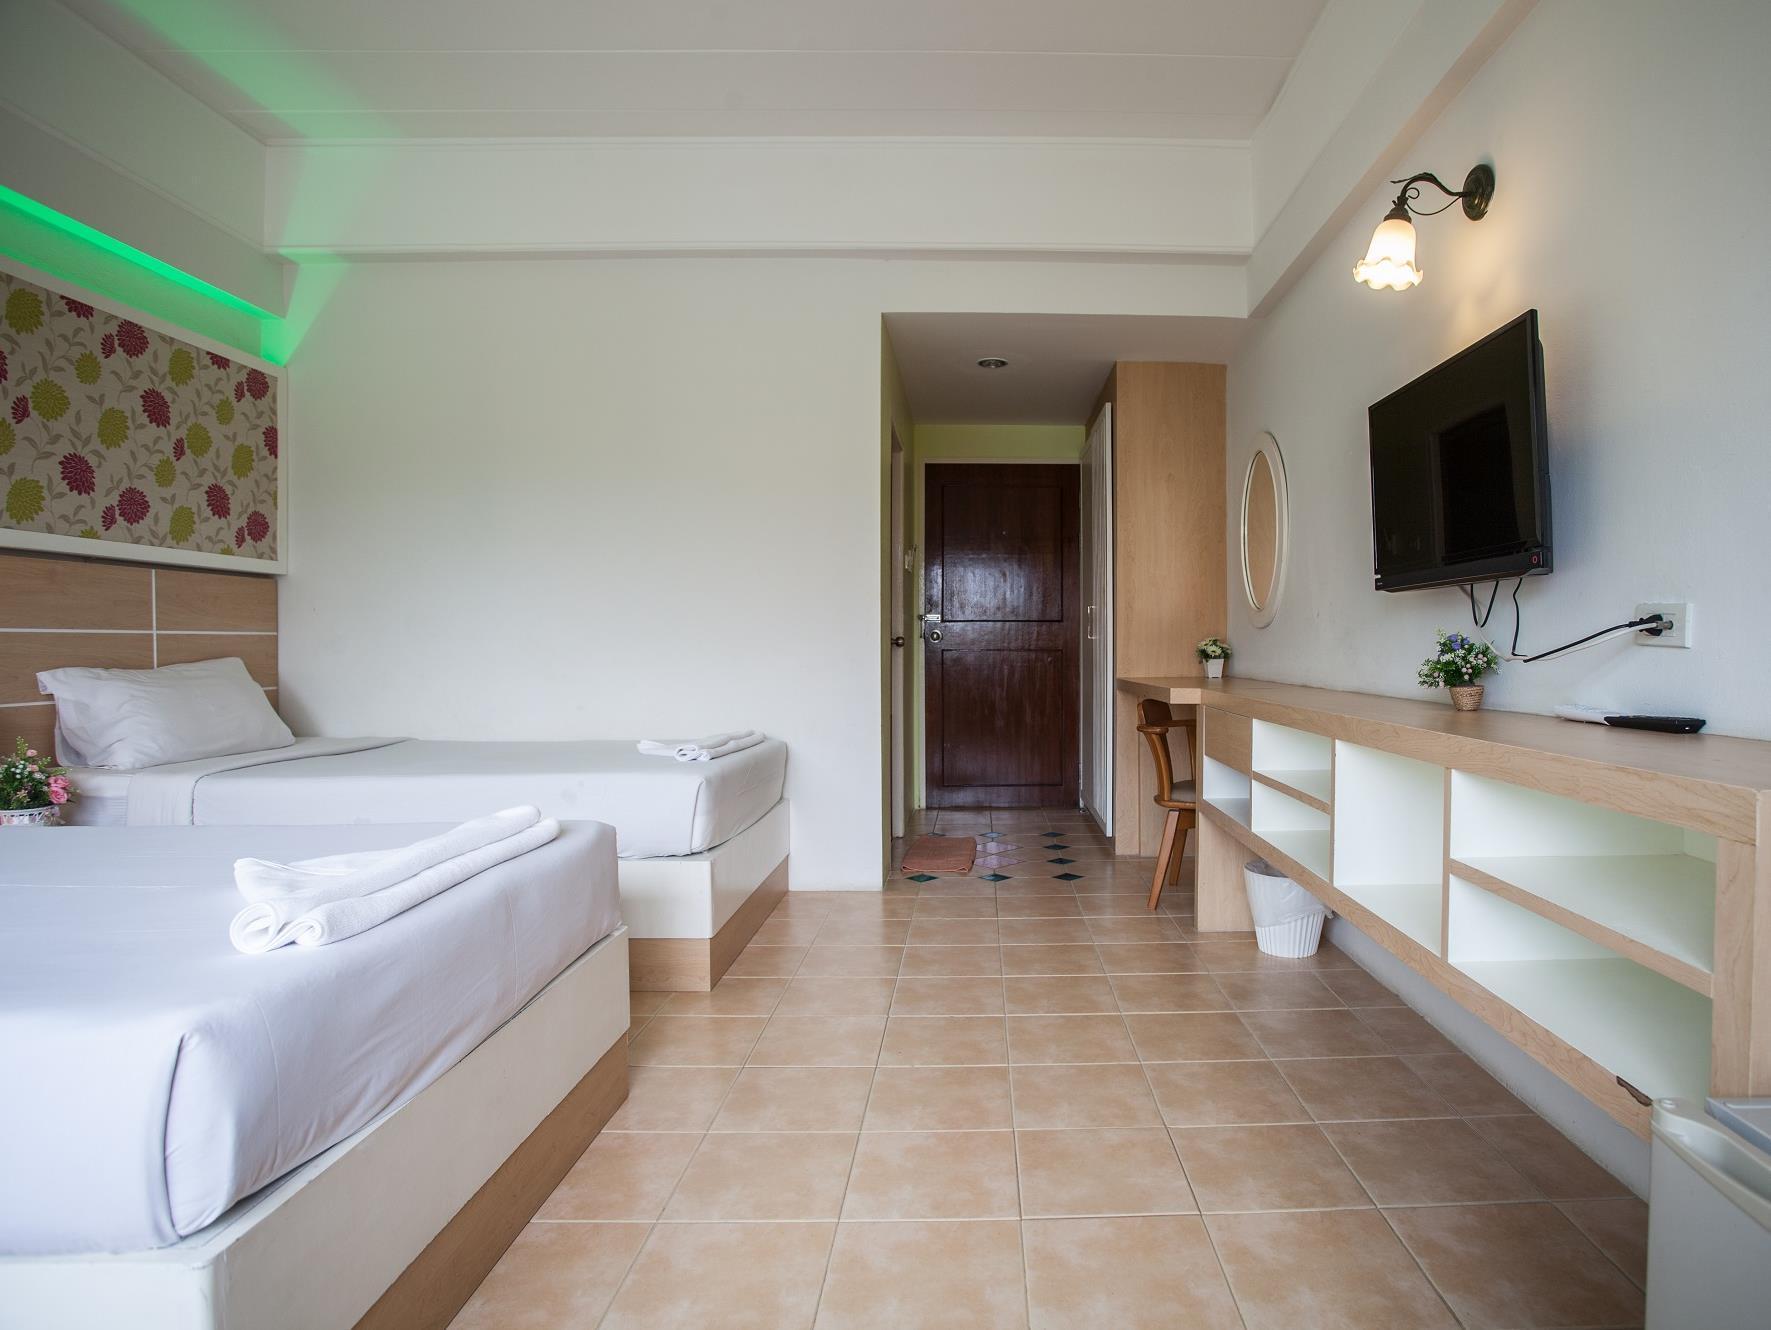 The Greenery Hotel 5